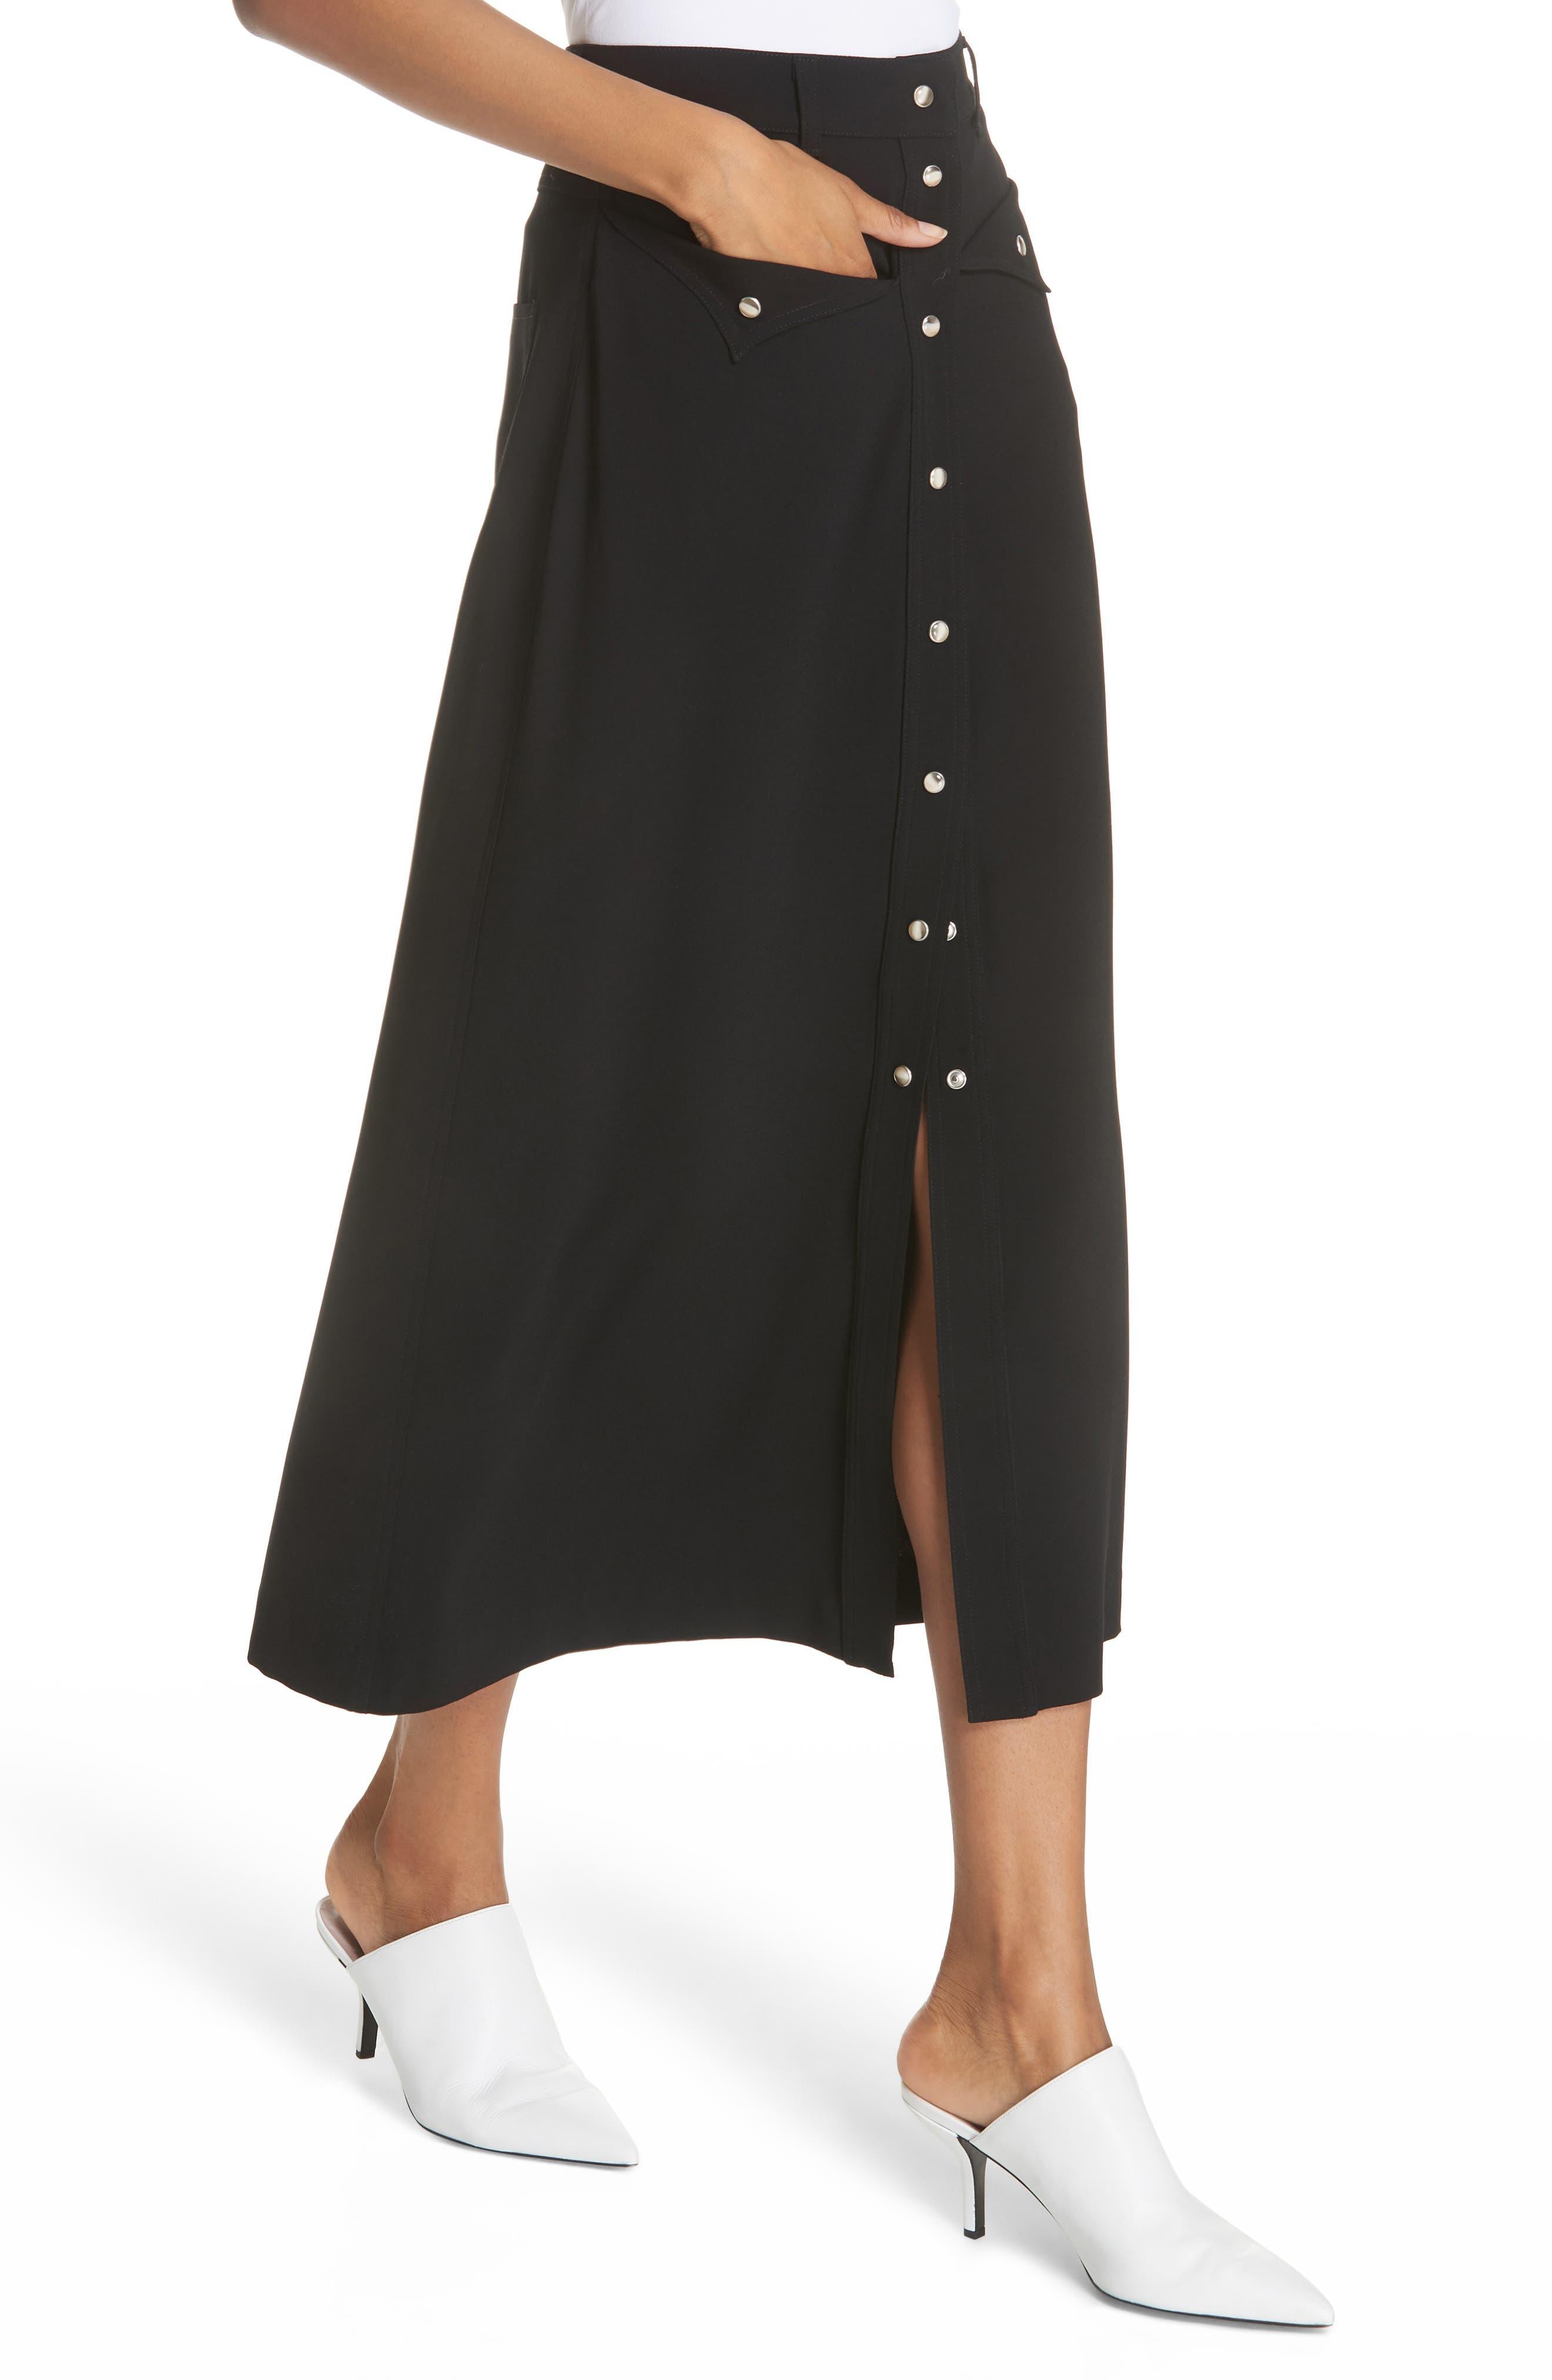 Meida Midi Skirt,                             Alternate thumbnail 4, color,                             003